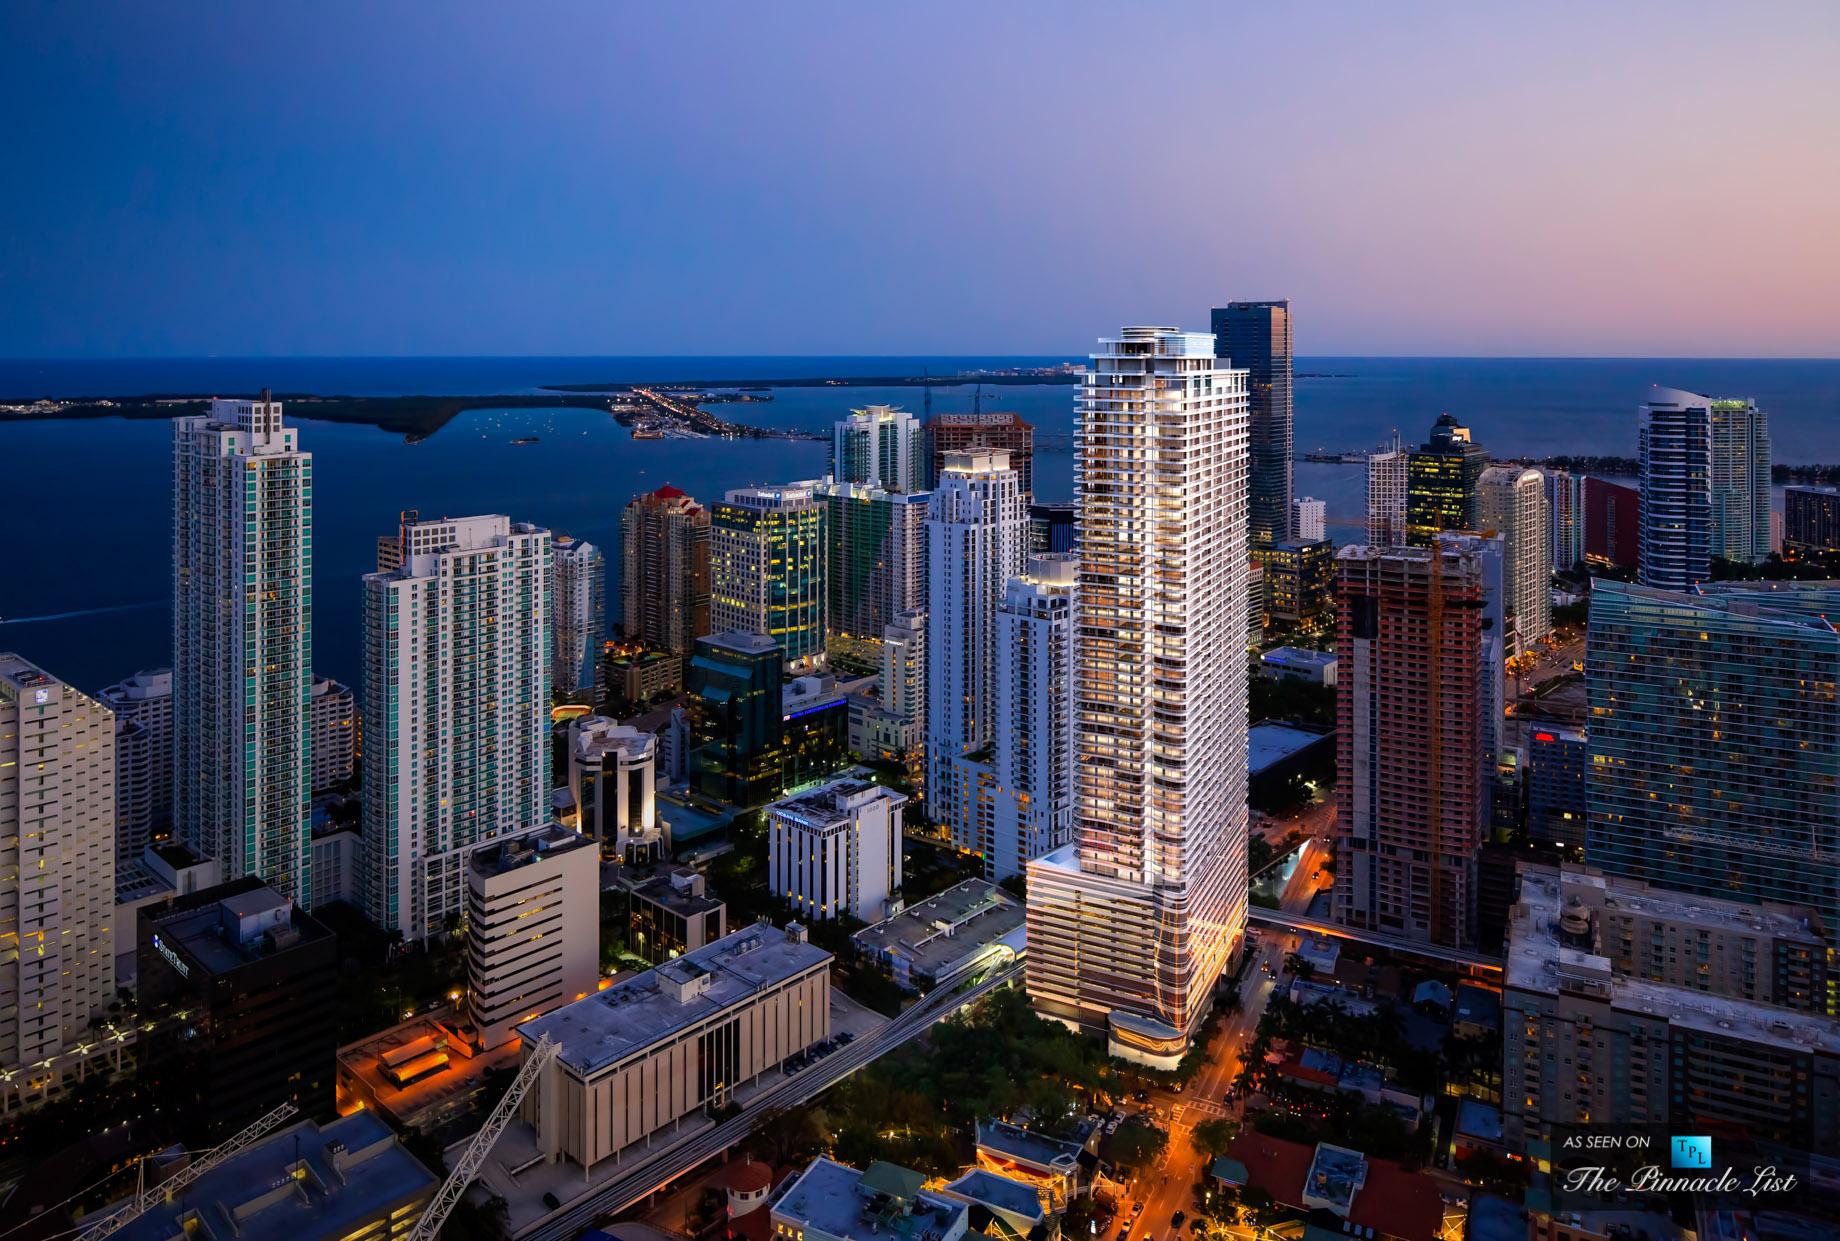 Brickell Flatiron Skyline - 1001 S Miami Ave, Miami, FL, USA